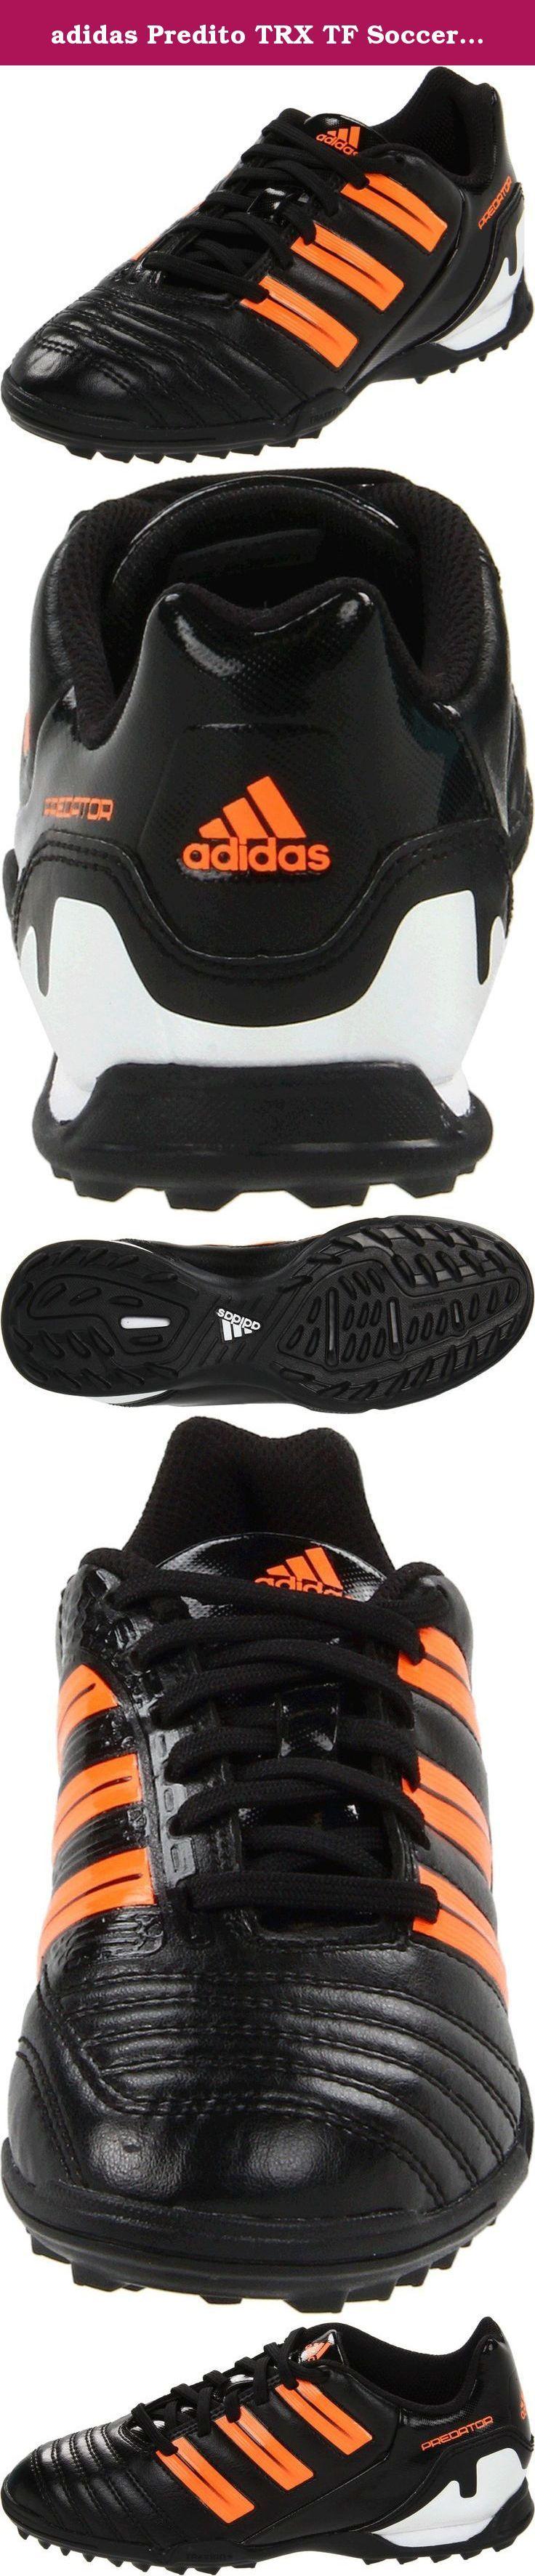 adidas Predito TRX TF Soccer Cleat (Toddler/Little Kid/Big Kid),Black/Warning/White,1.5 M US Little Kid.